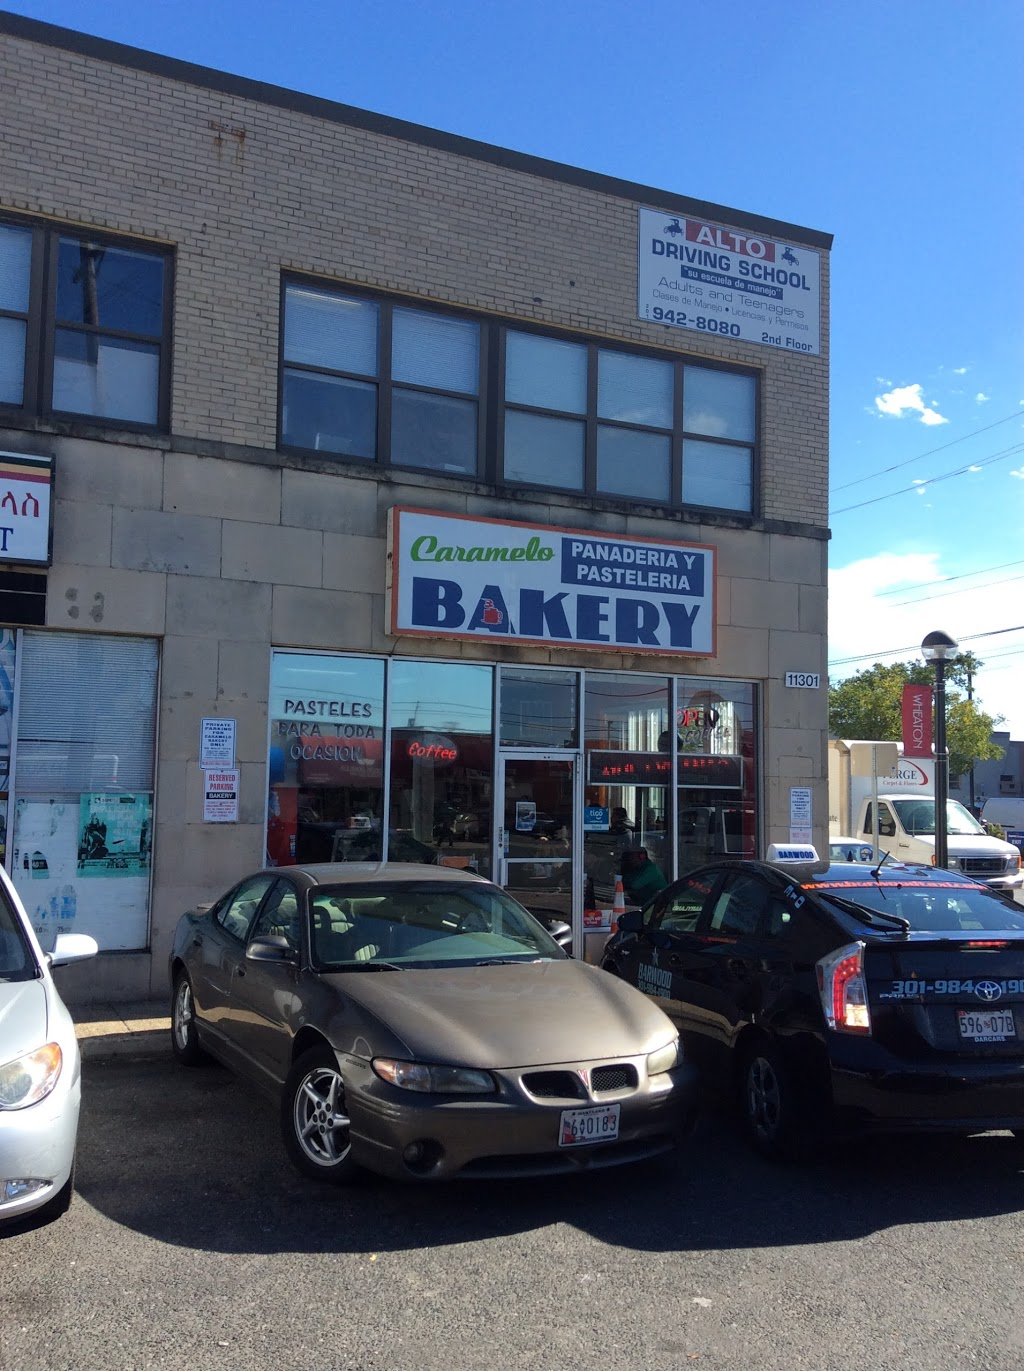 Caramelo Bakery - bakery  | Photo 3 of 10 | Address: 11301 Georgia Ave, Silver Spring, MD 20902, USA | Phone: (301) 942-9330